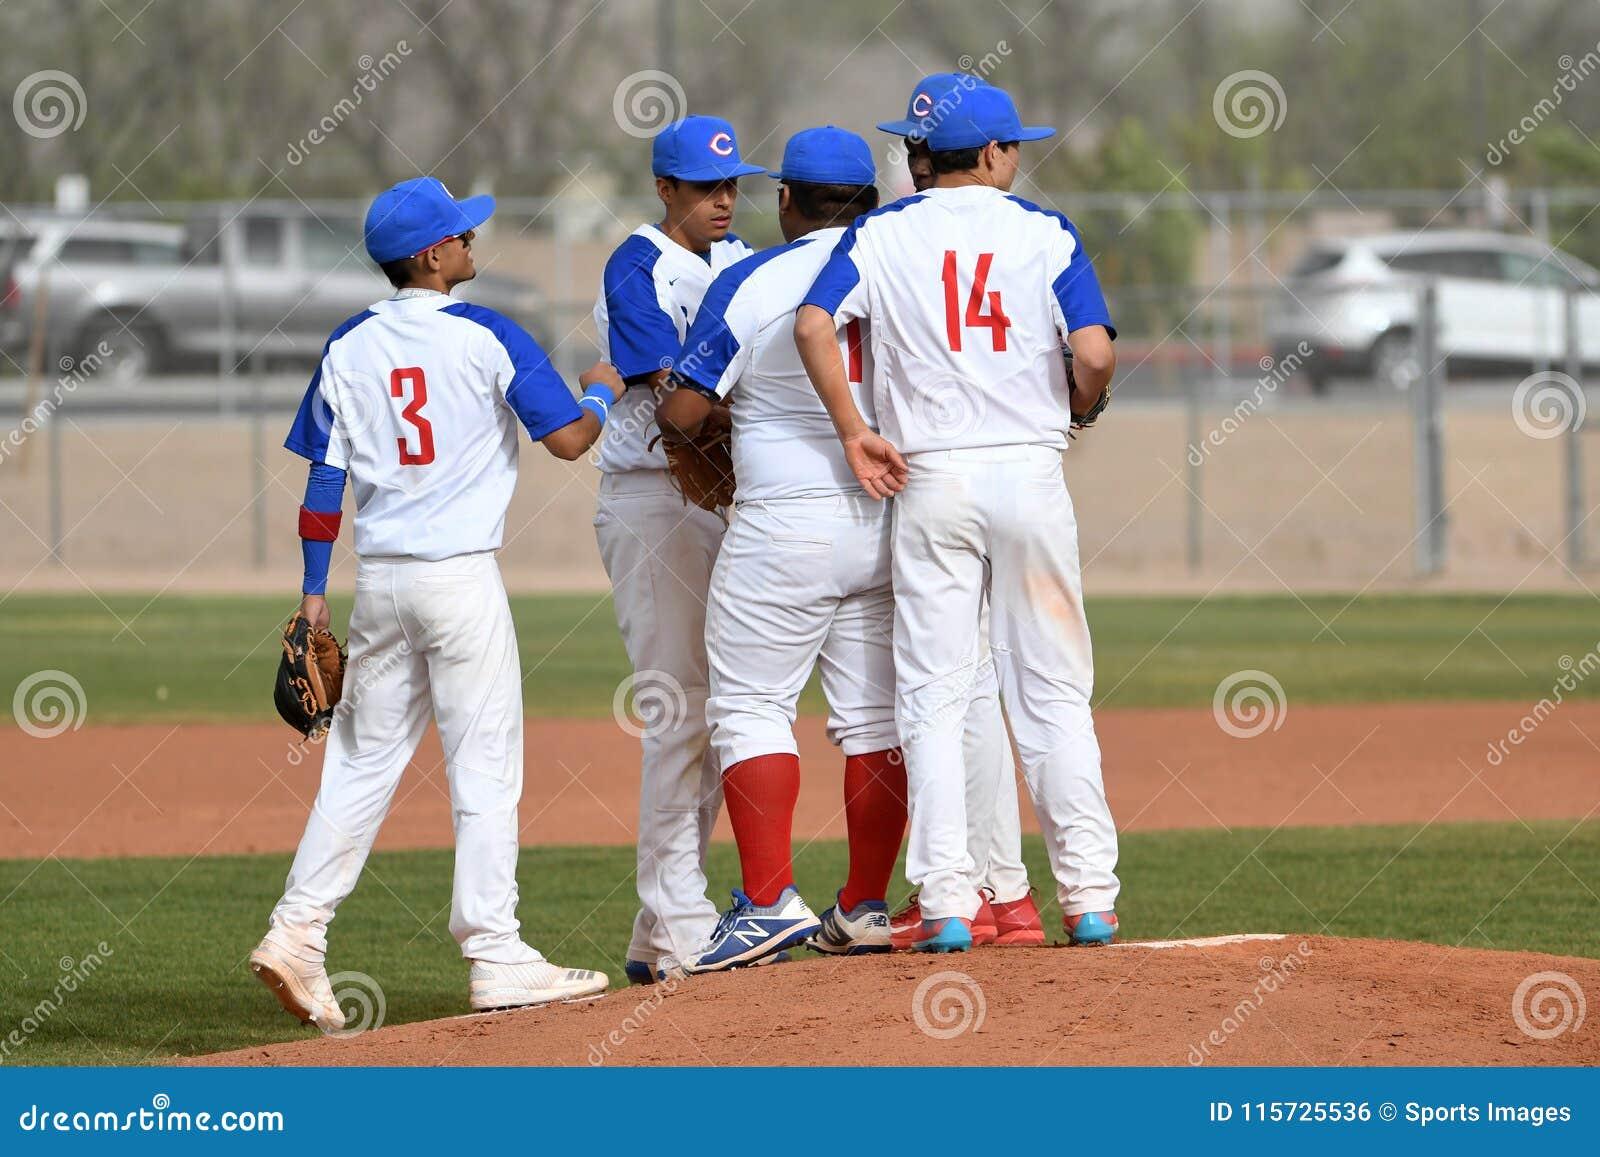 High School Baseball editorial photo  Image of players